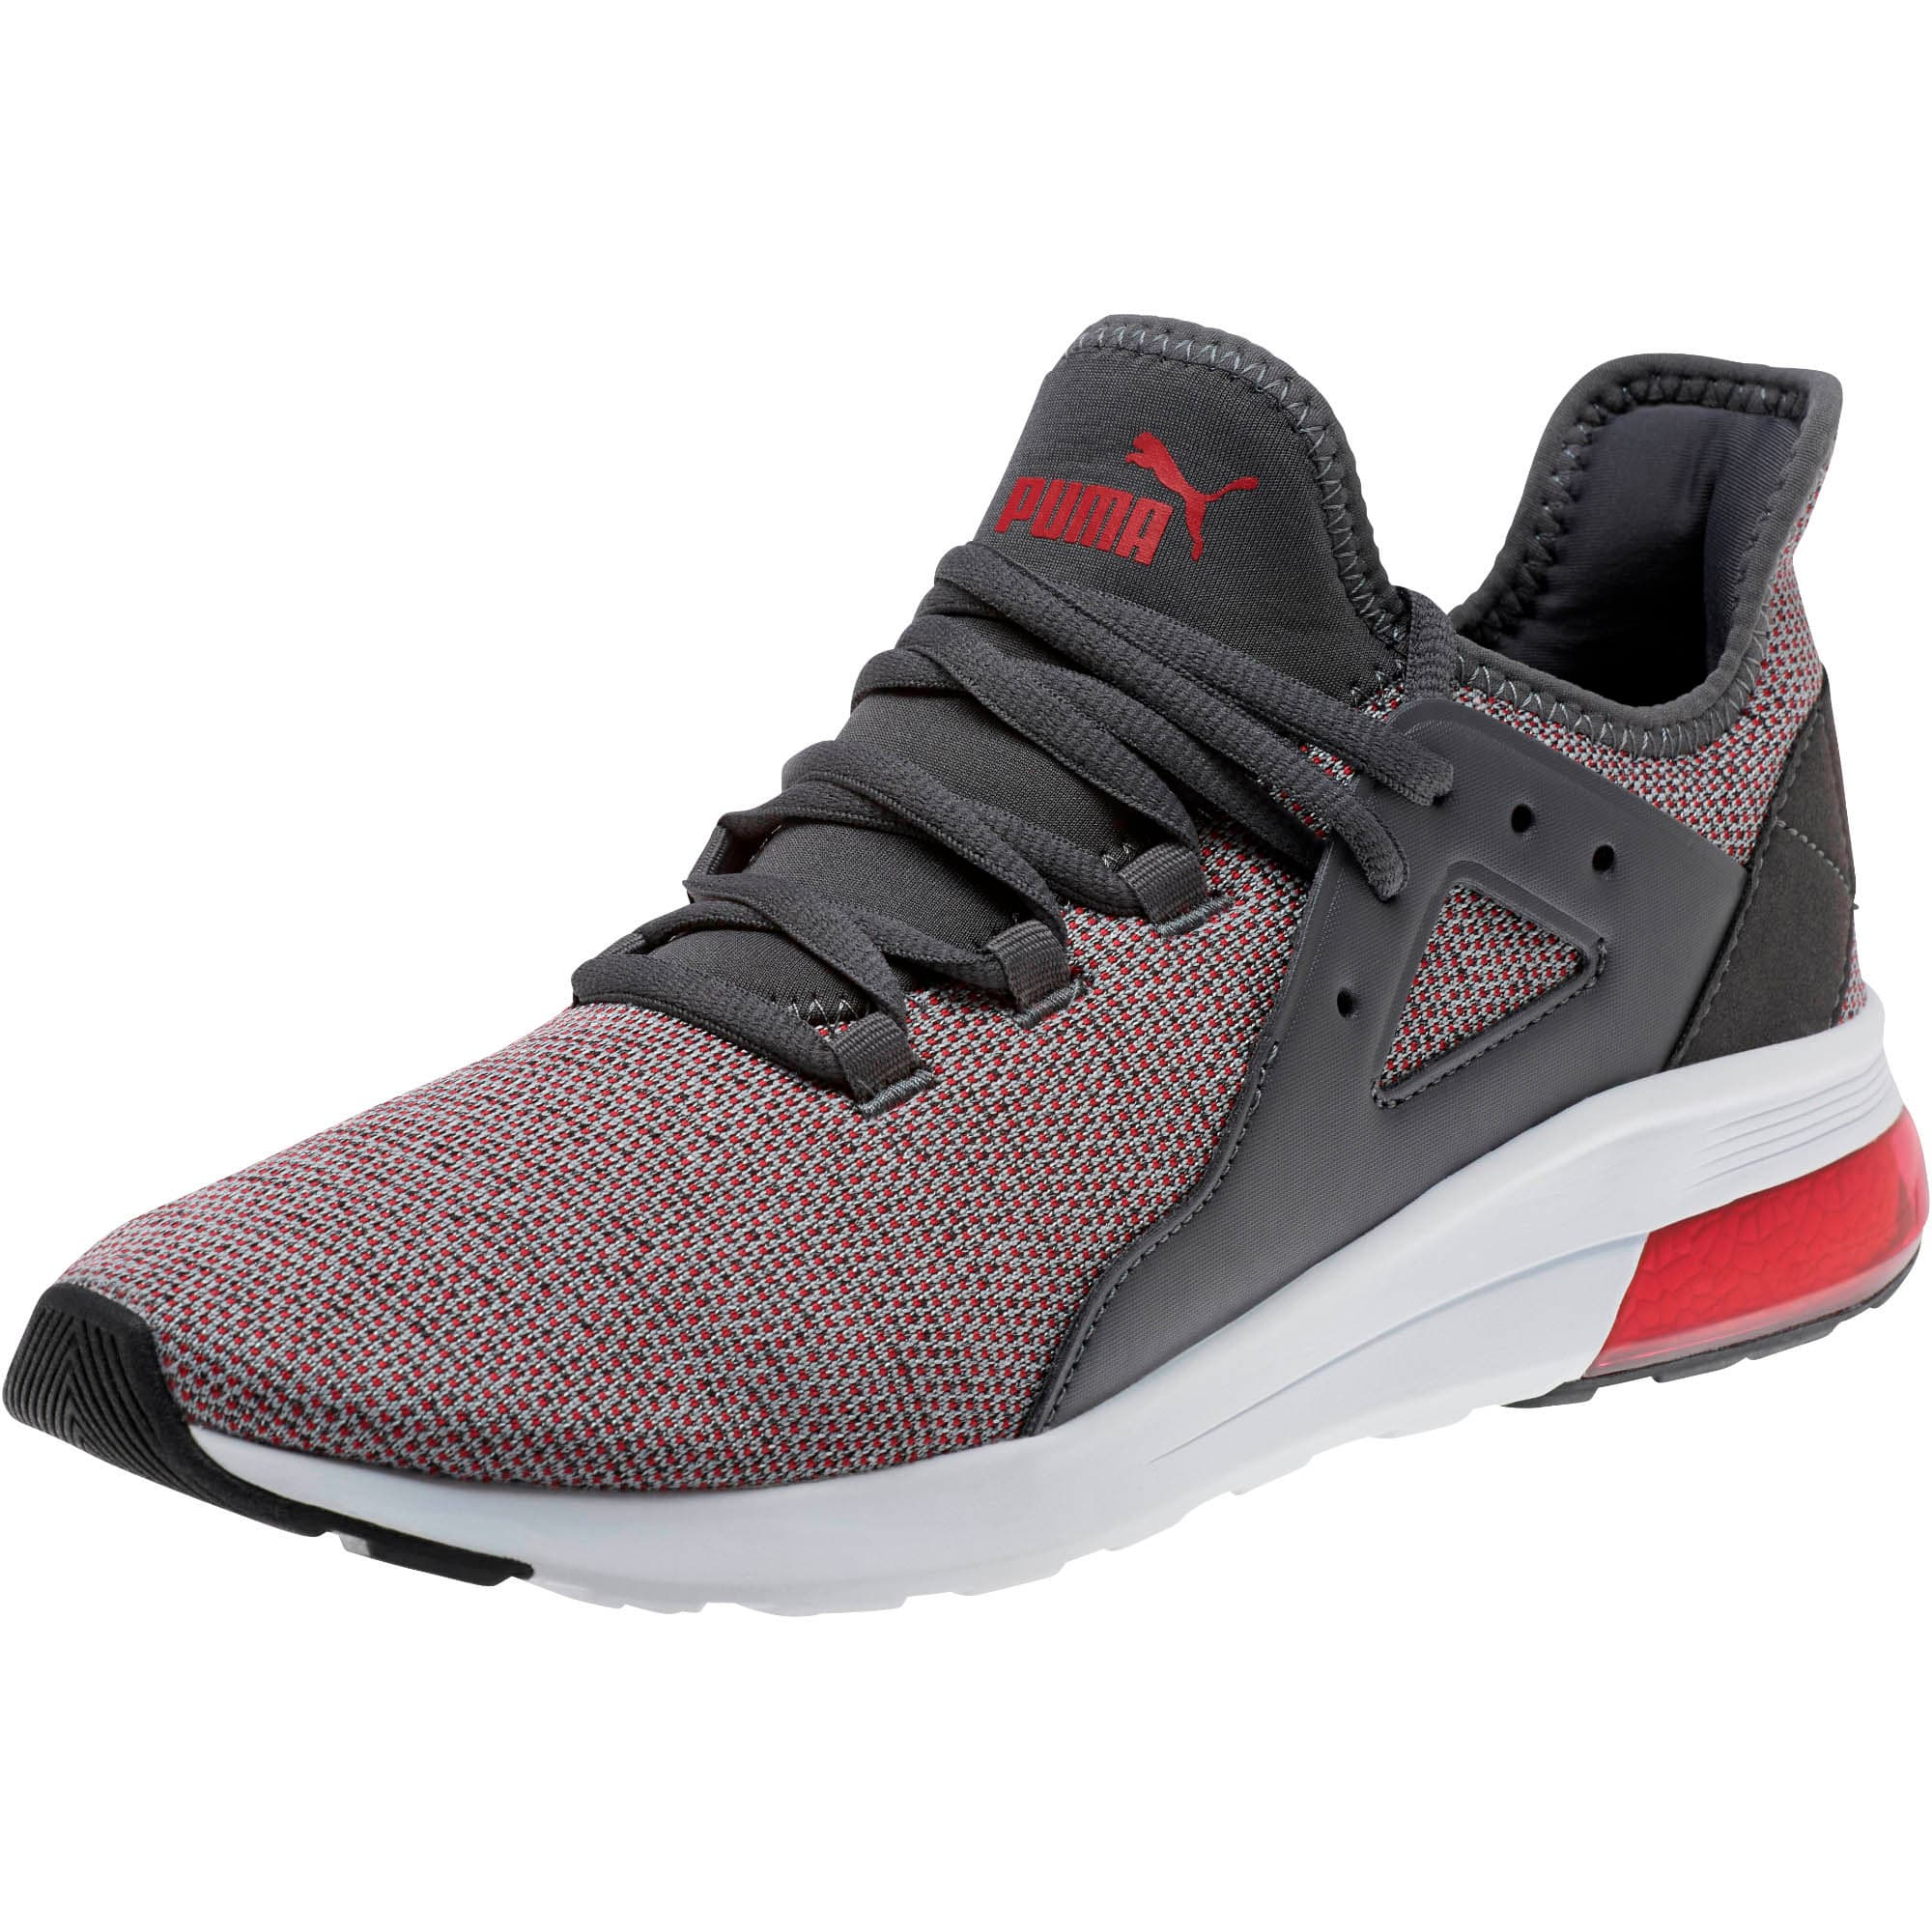 Thumbnail 1 of Electron Street Knit Sneakers, Iron Gate-Ribbon Red, medium